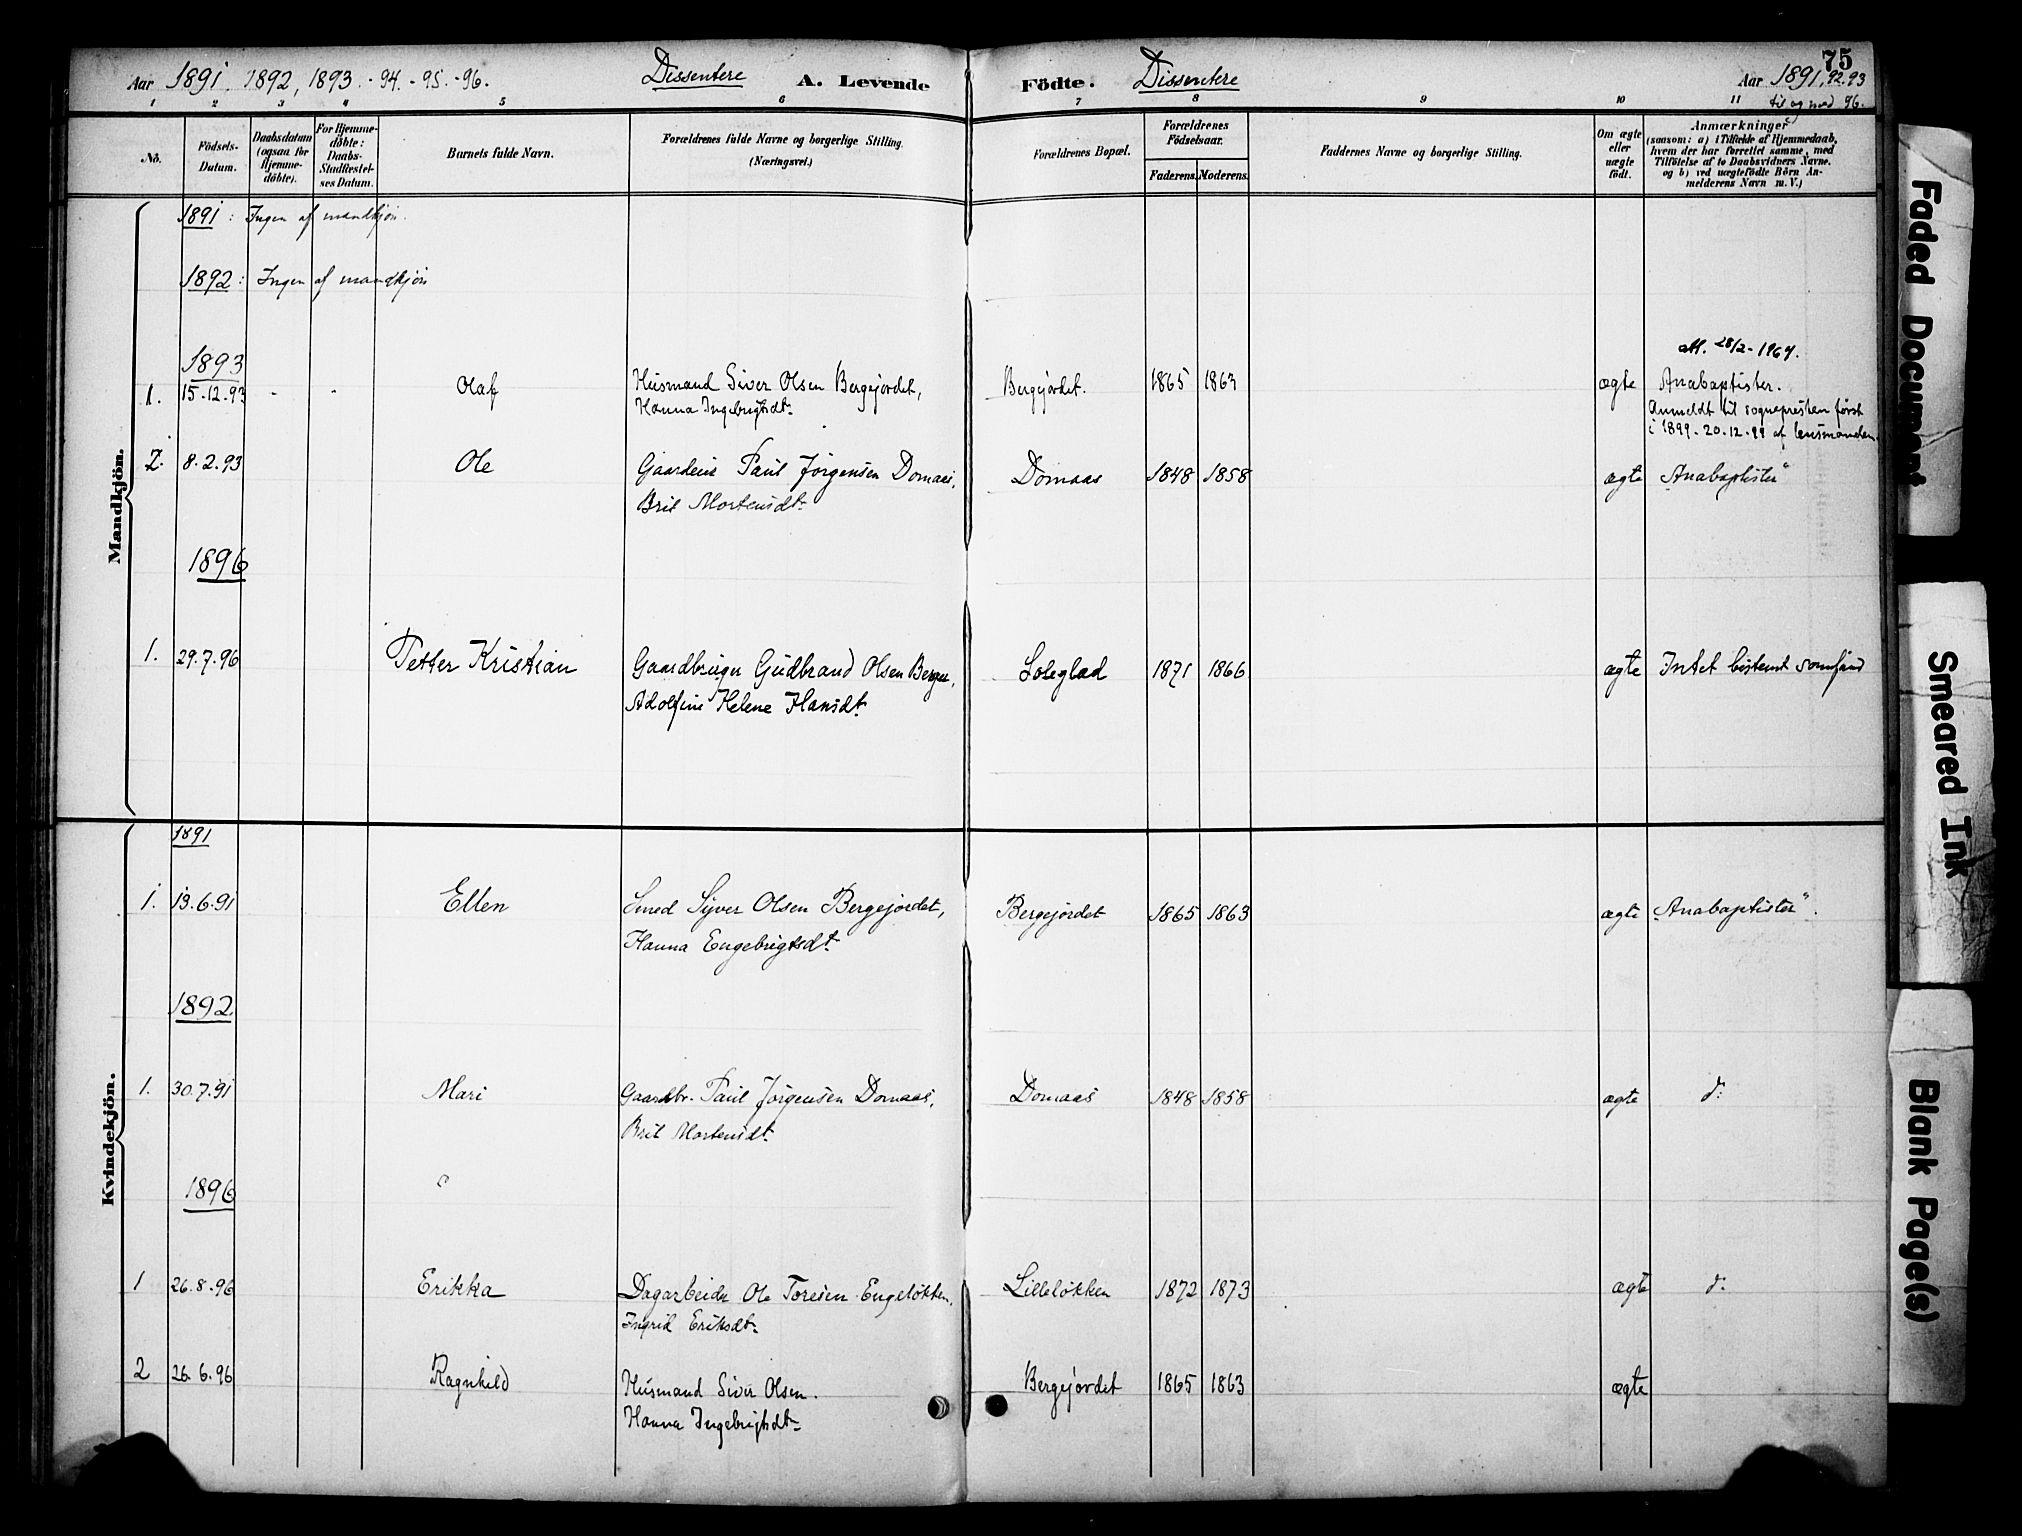 SAH, Dovre prestekontor, Ministerialbok nr. 3, 1891-1901, s. 75